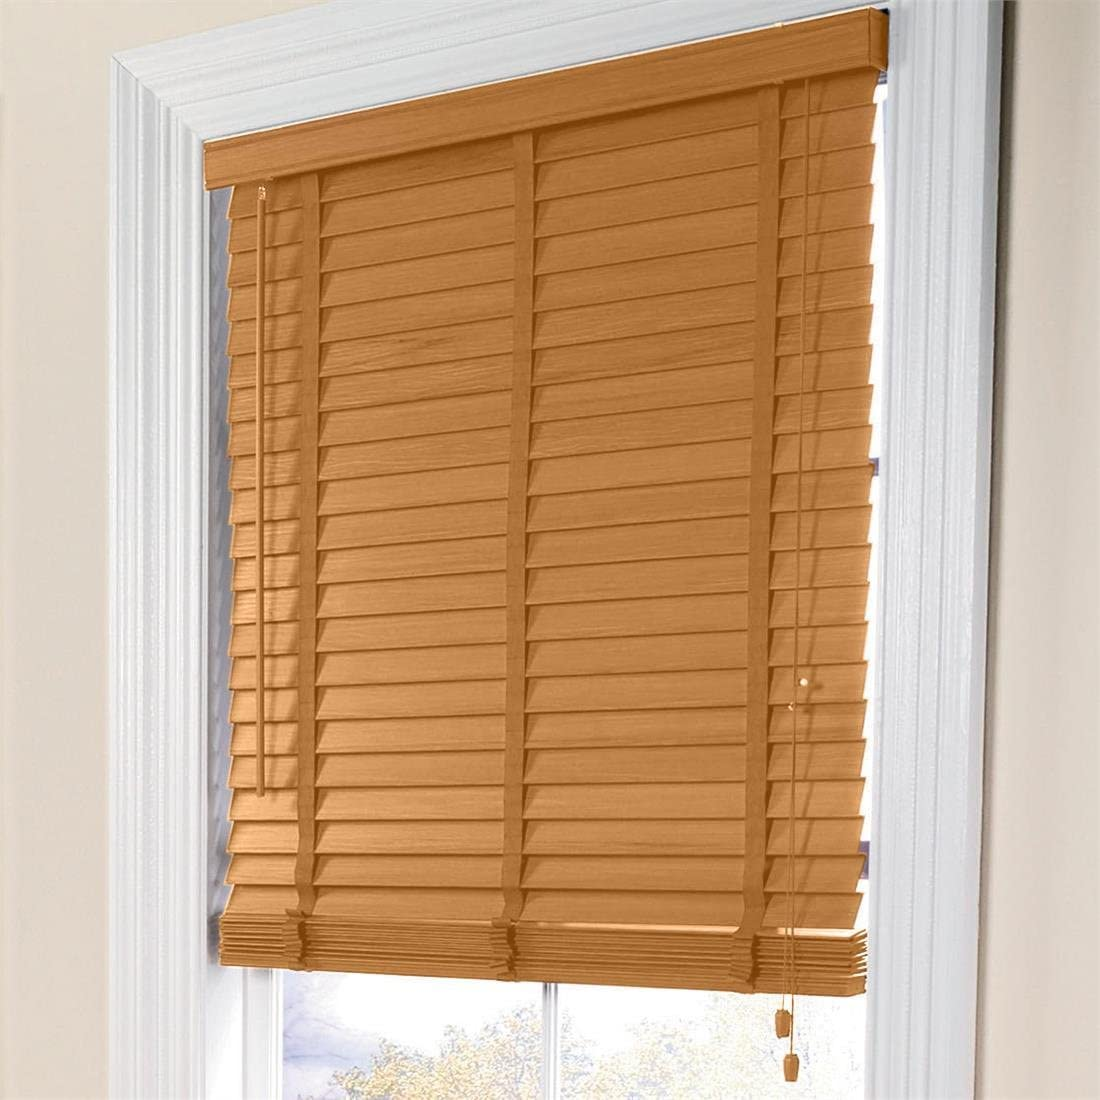 Brylanehome 2 Inch Width Slat Imitation Wood Blinds – 31 – 48 W X 64 L Oak,39 W 64 L